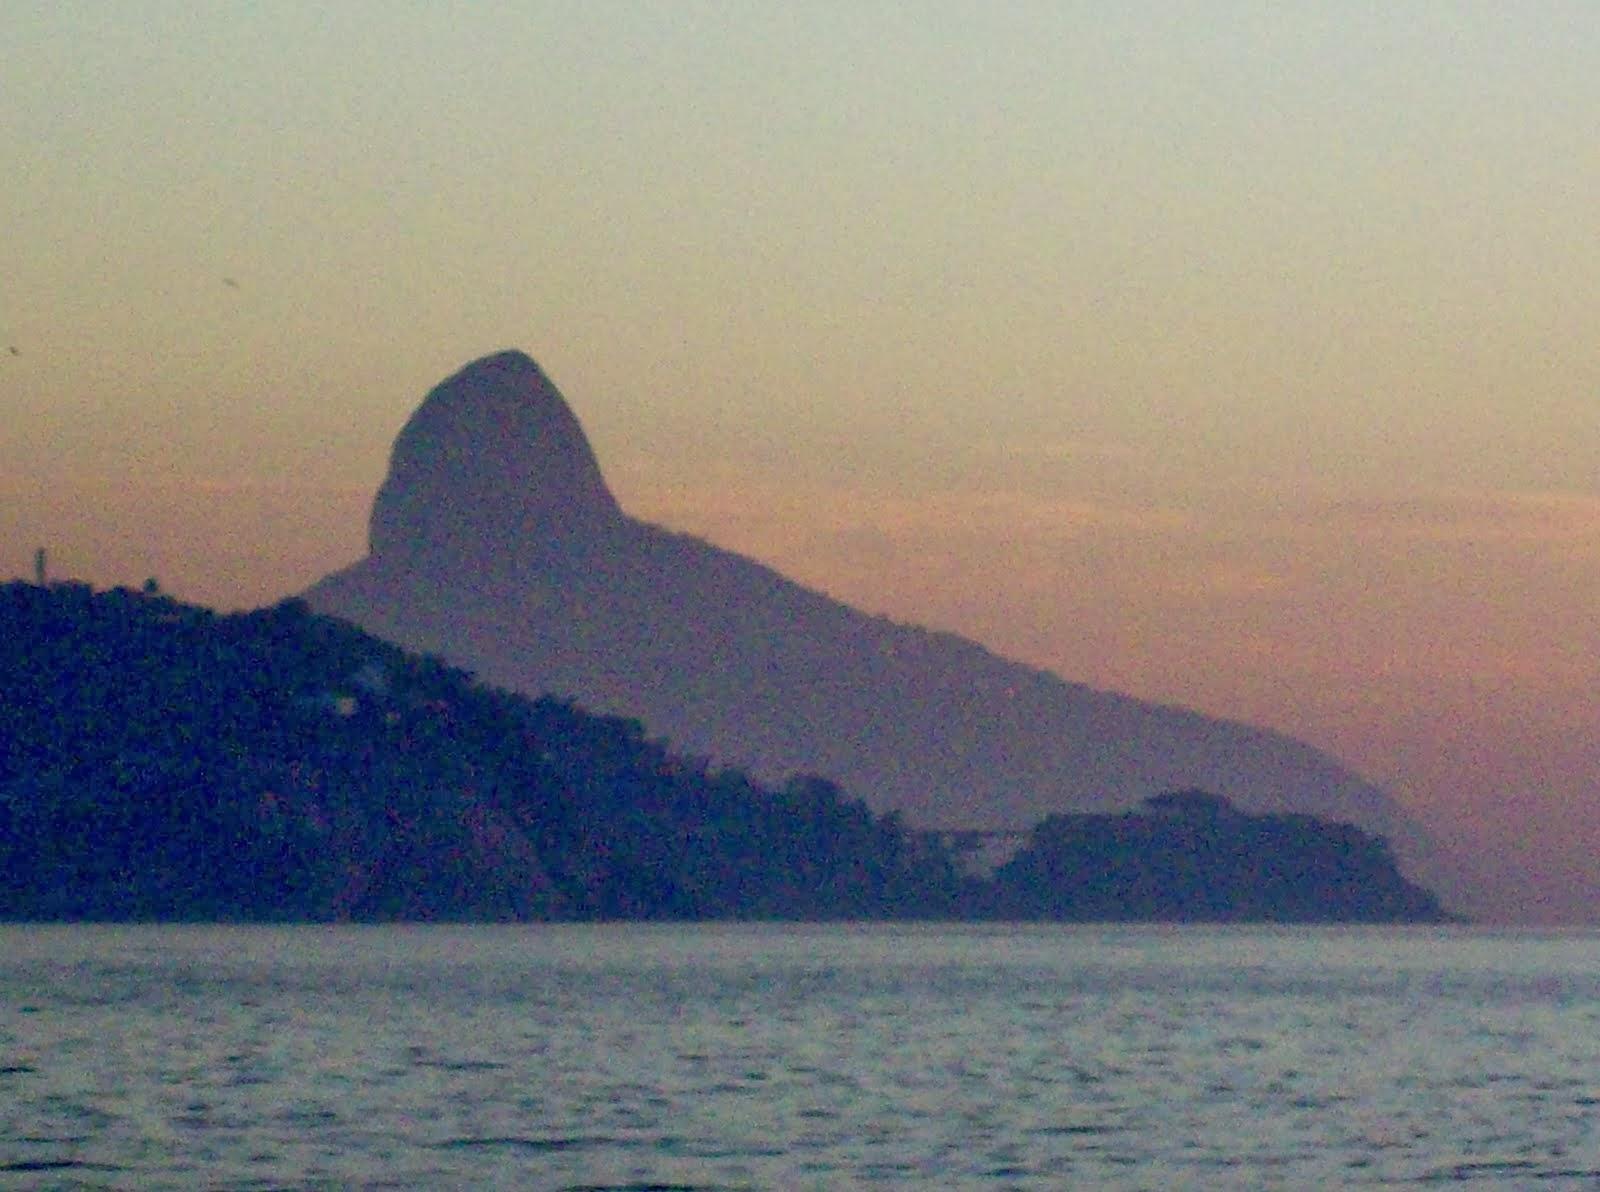 Travessia Angra/Rio 30/12/13